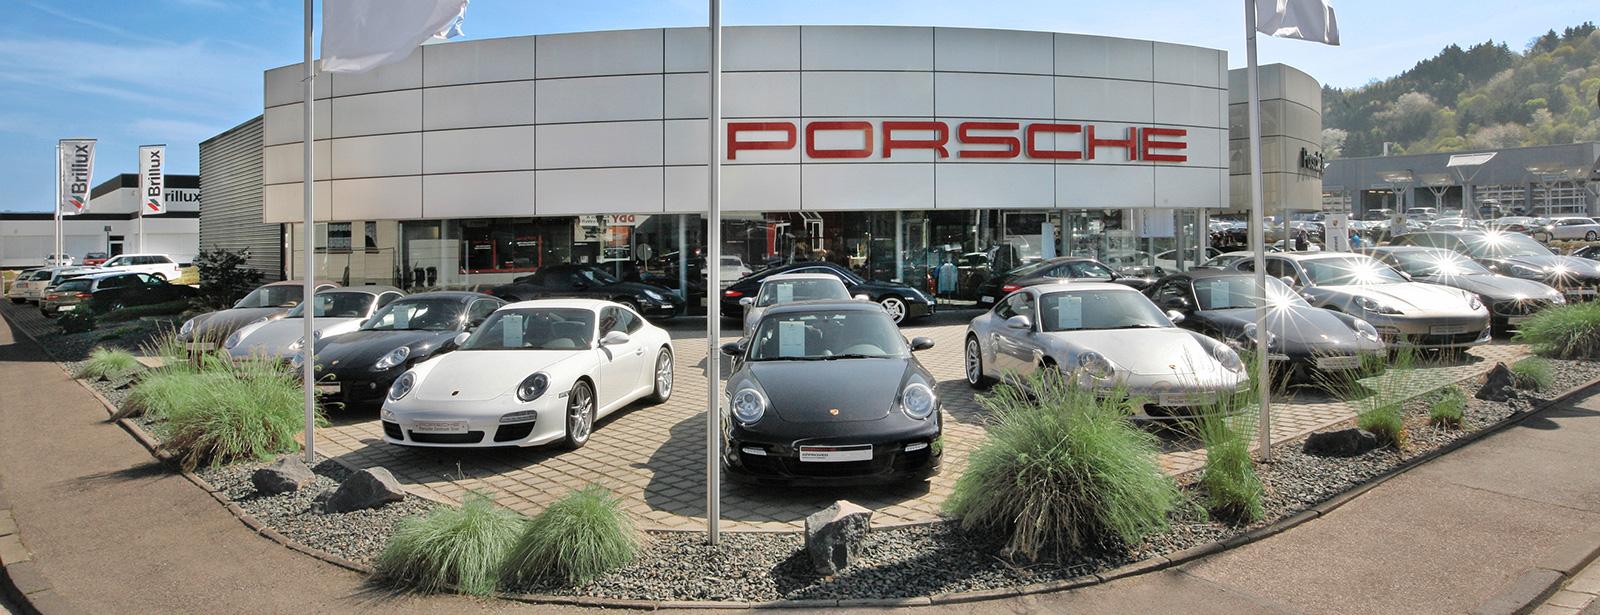 Porsche Centre Trier